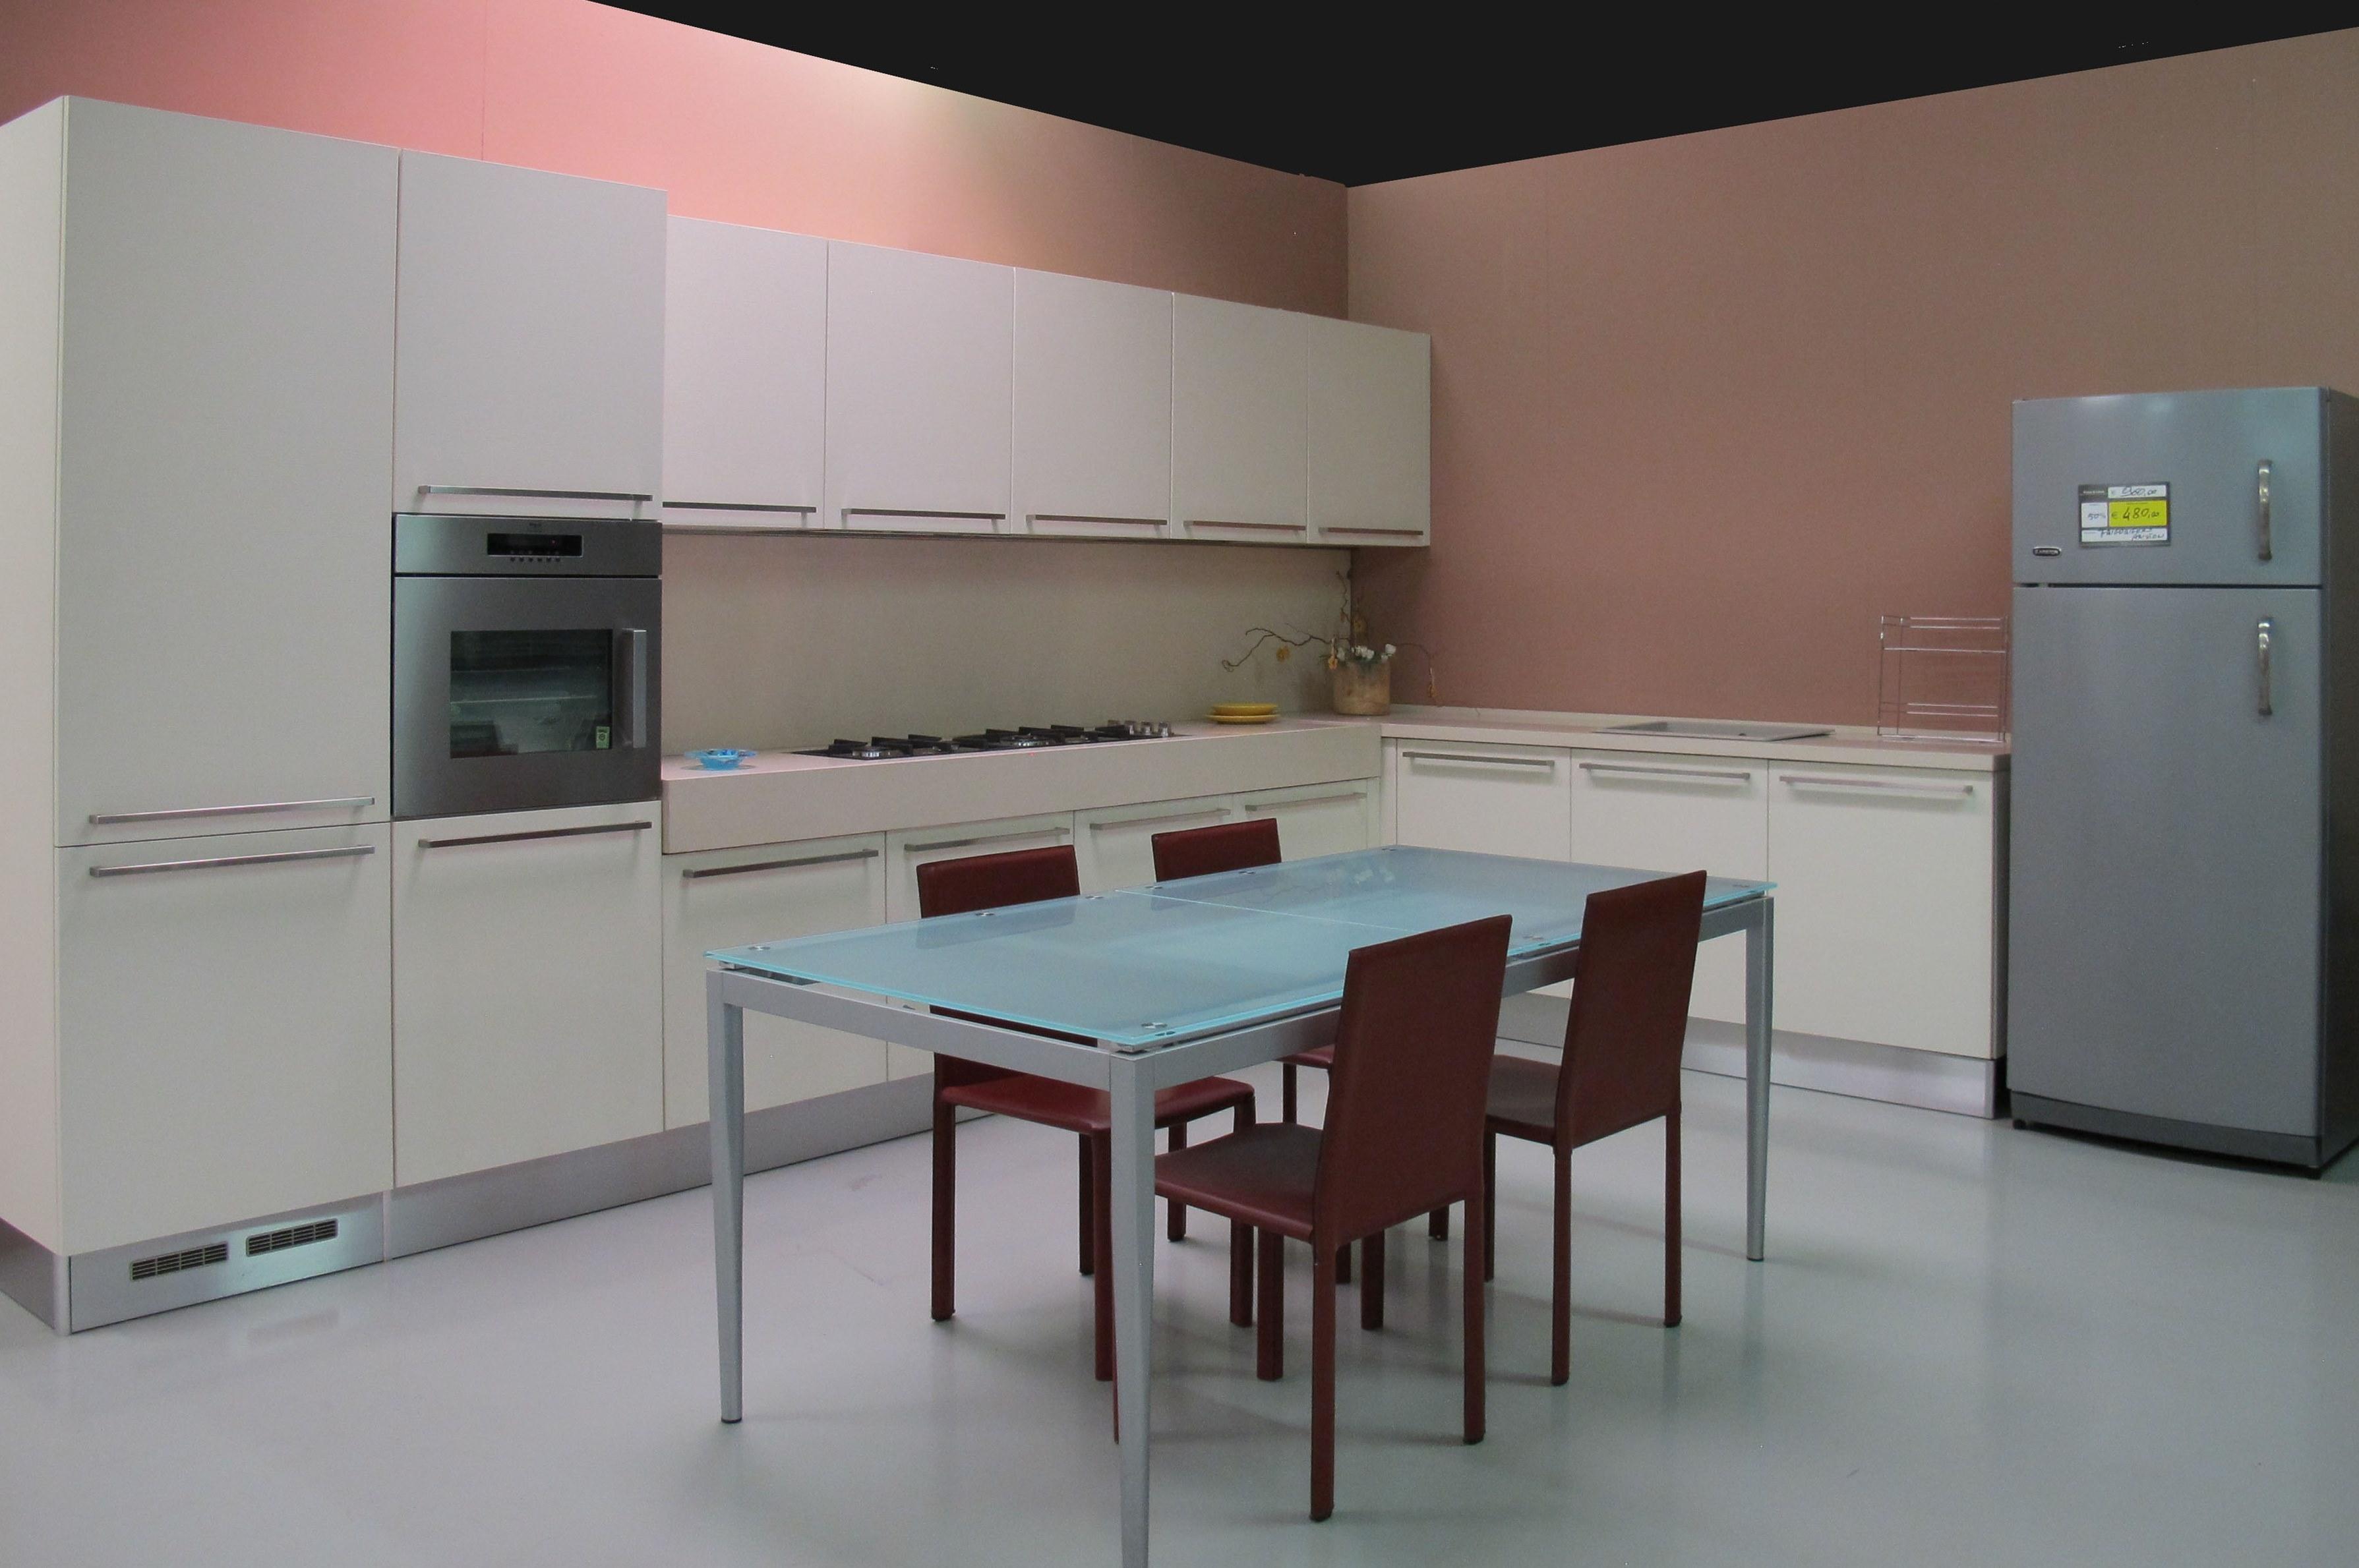 Cucina Bianca Bombata: Bring cucine mobili di qualità al giusto ...